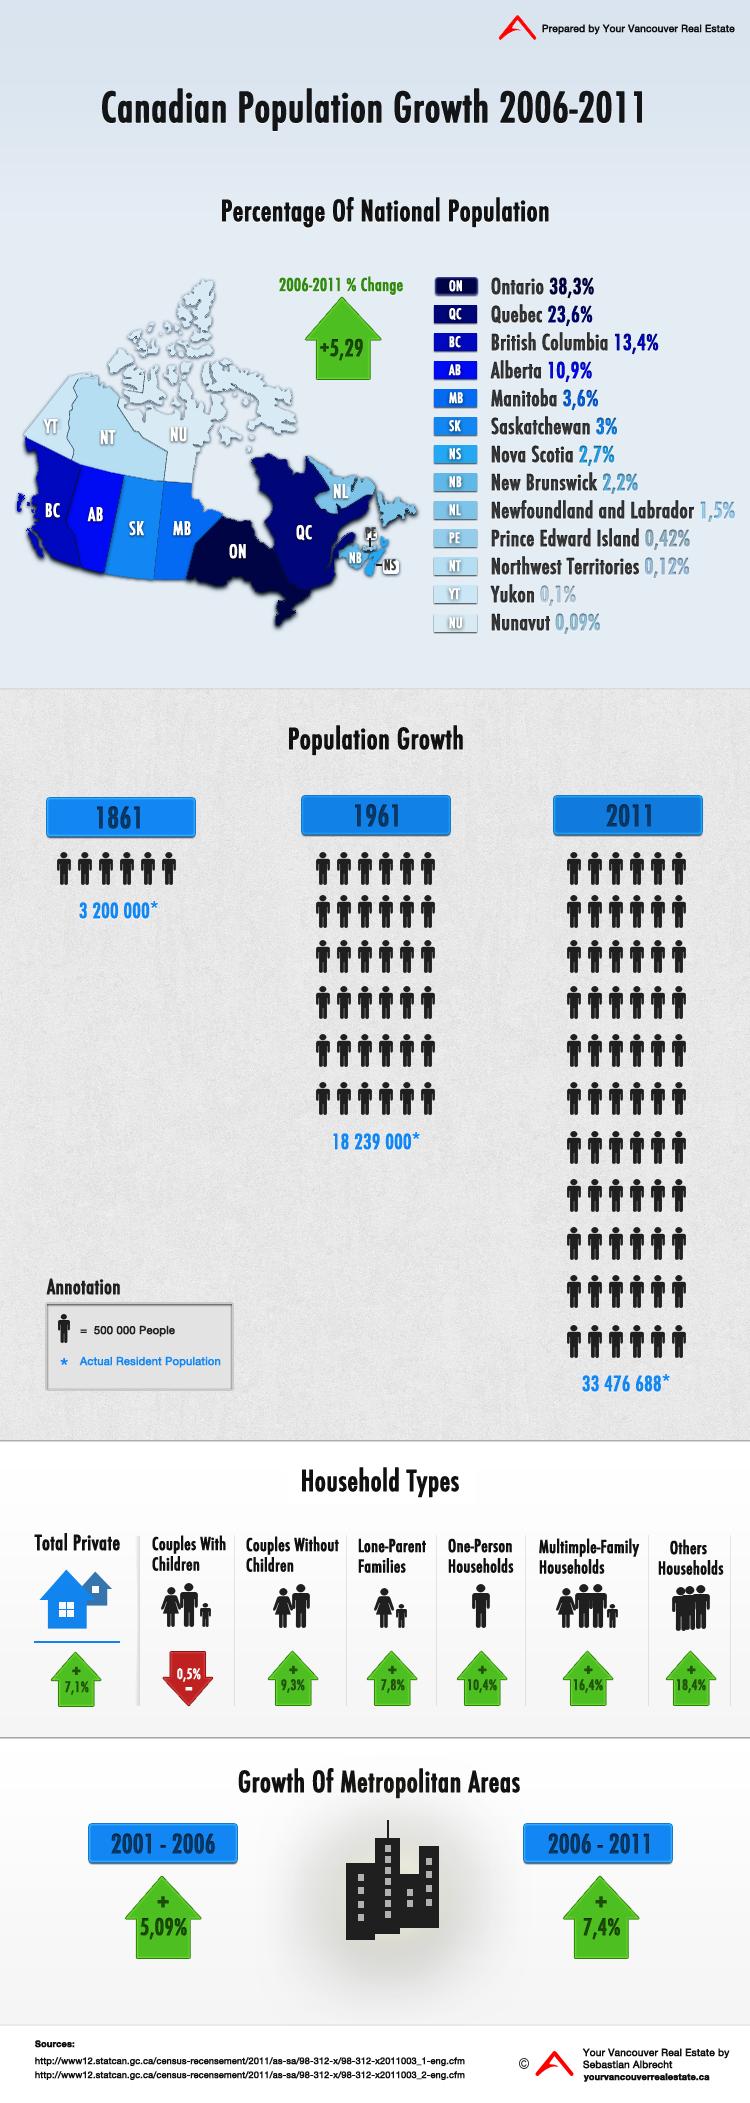 Canada's Population Growth